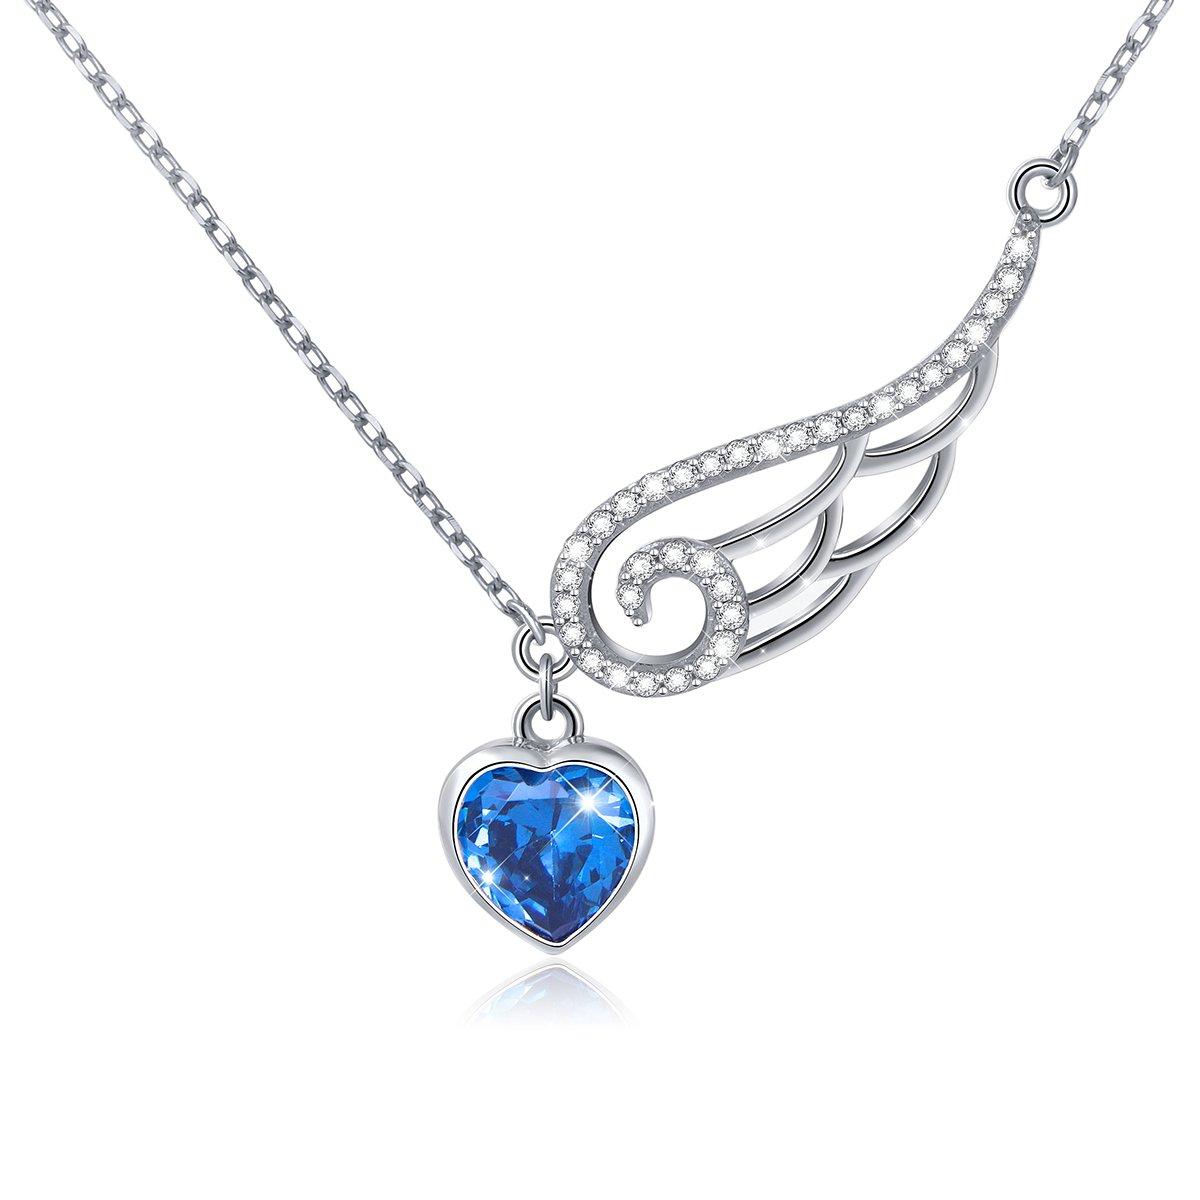 SILVER MOUNTAIN 925 Sterling Silver Blue Cubic Zirconia Heart Guardian Angel Wing Best Friend Necklaces for Women